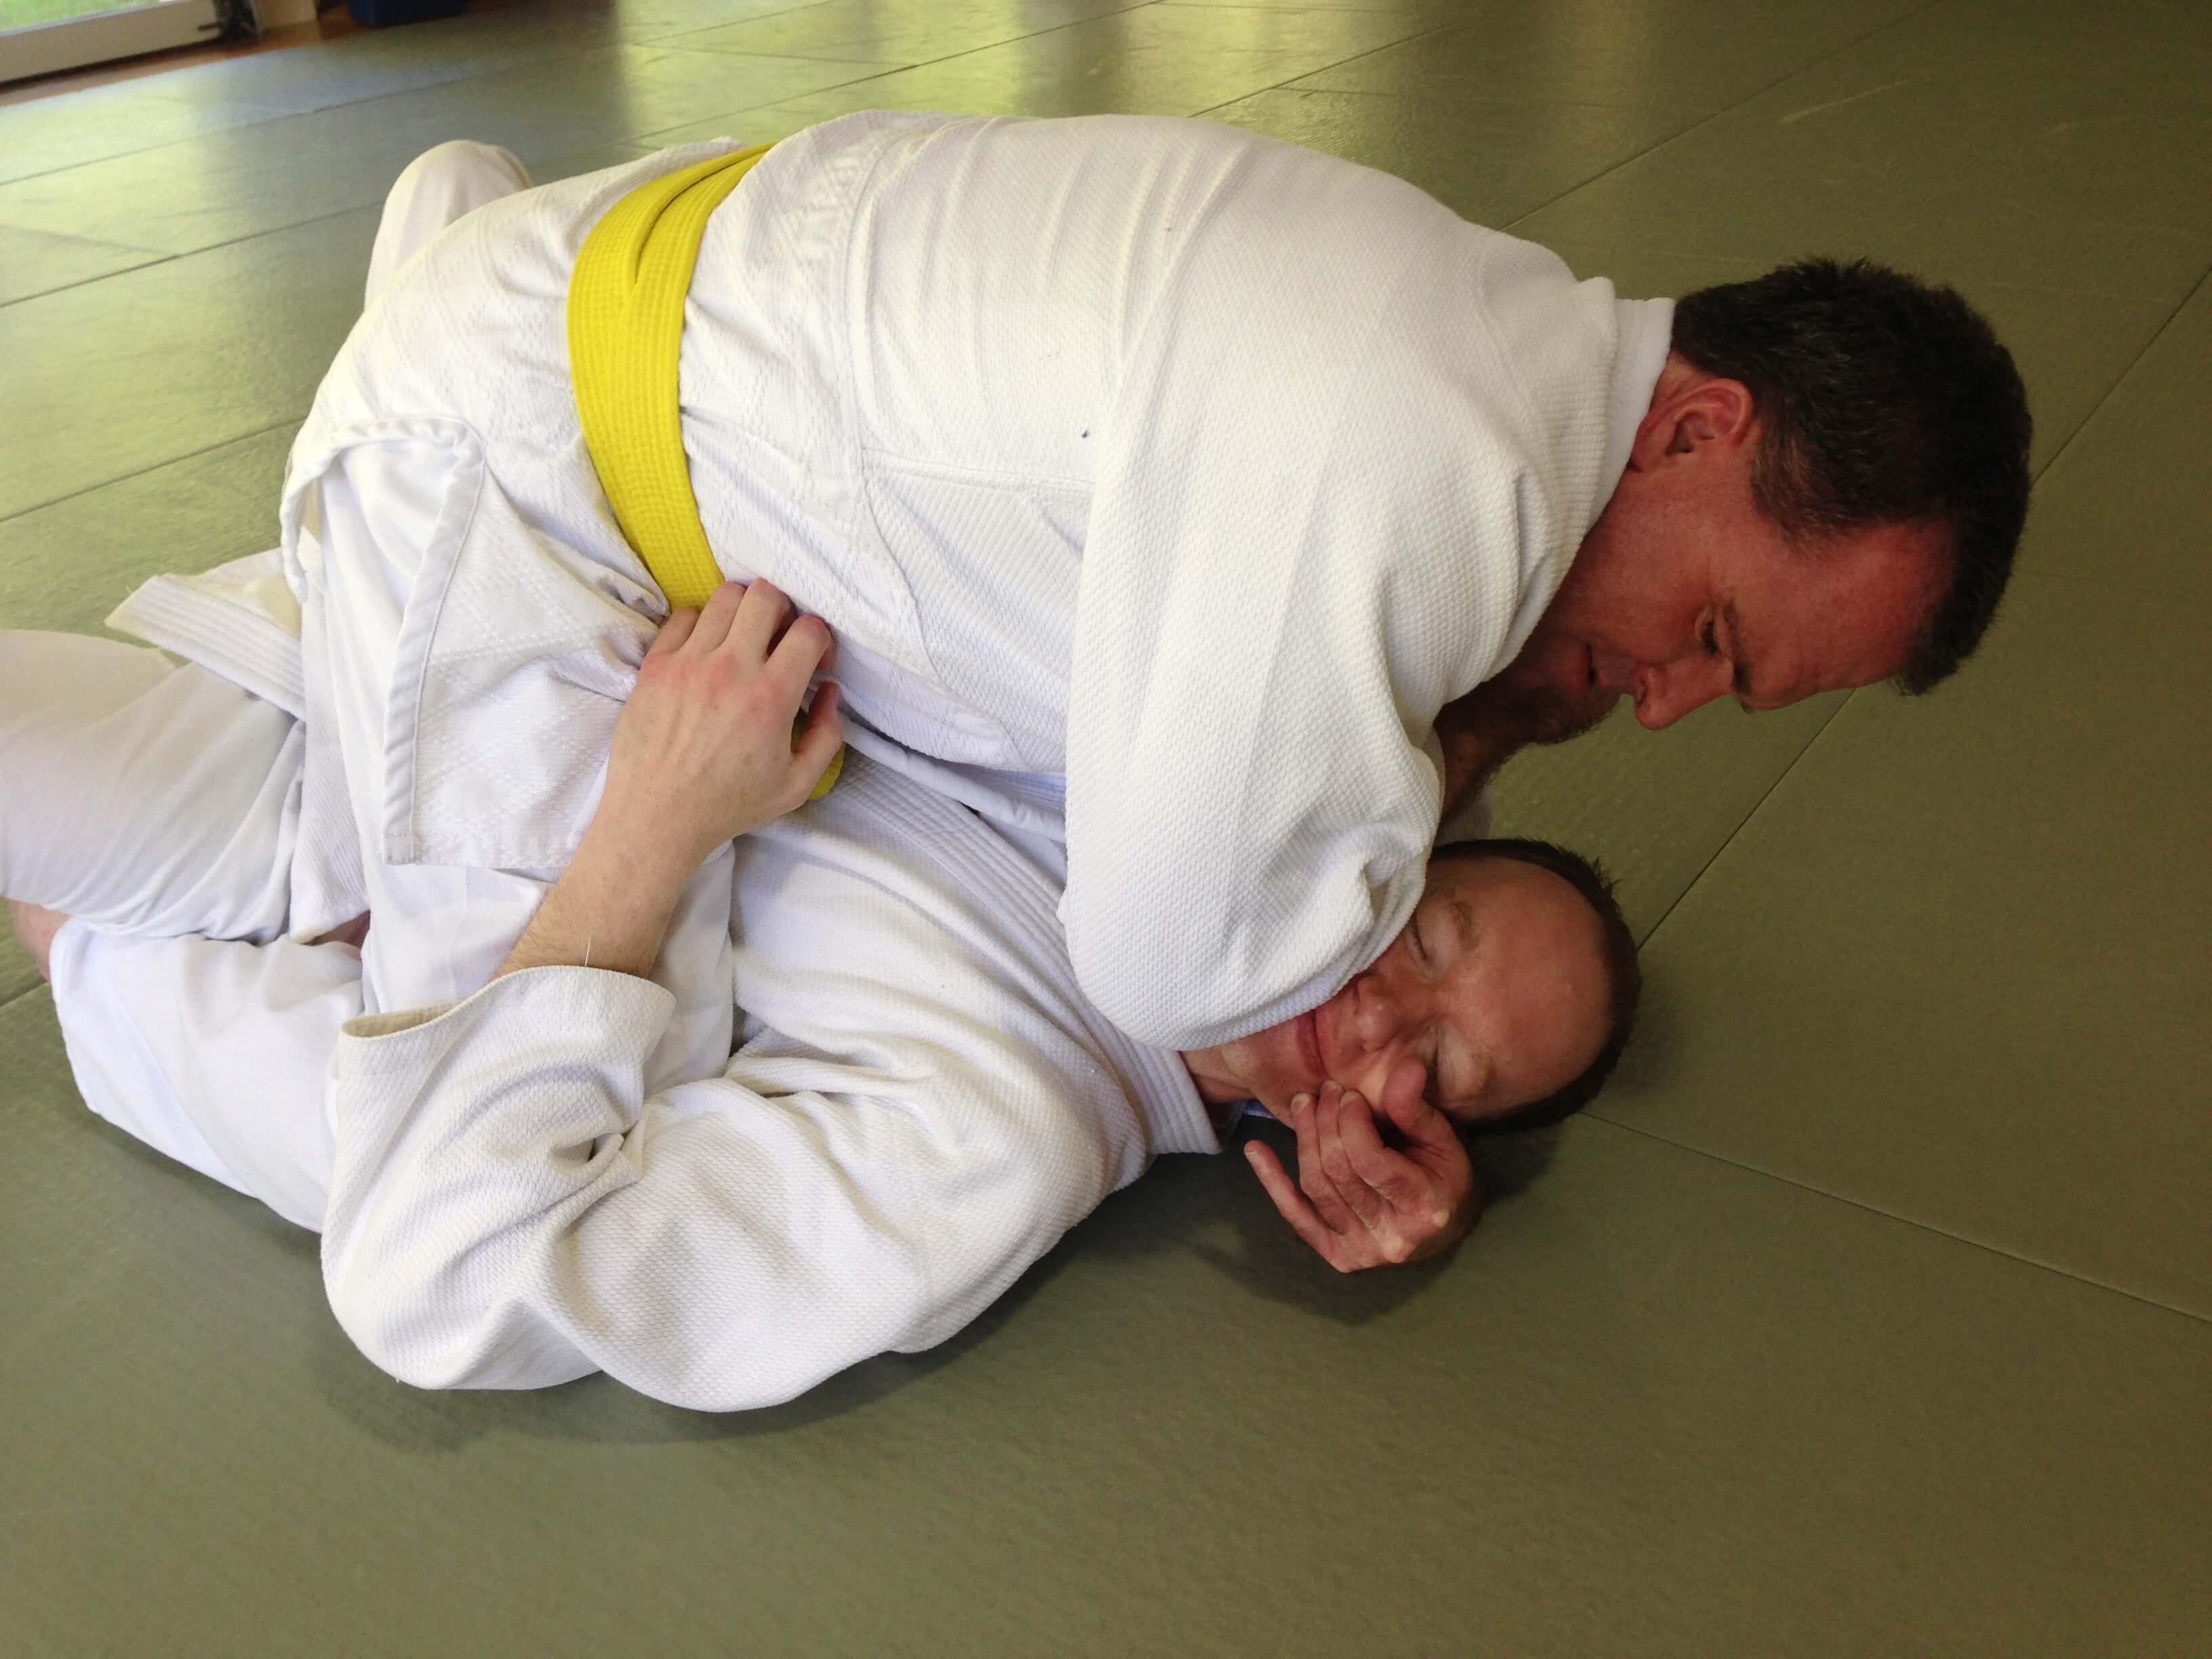 Best Jiu Jitsu class in Roswell GA